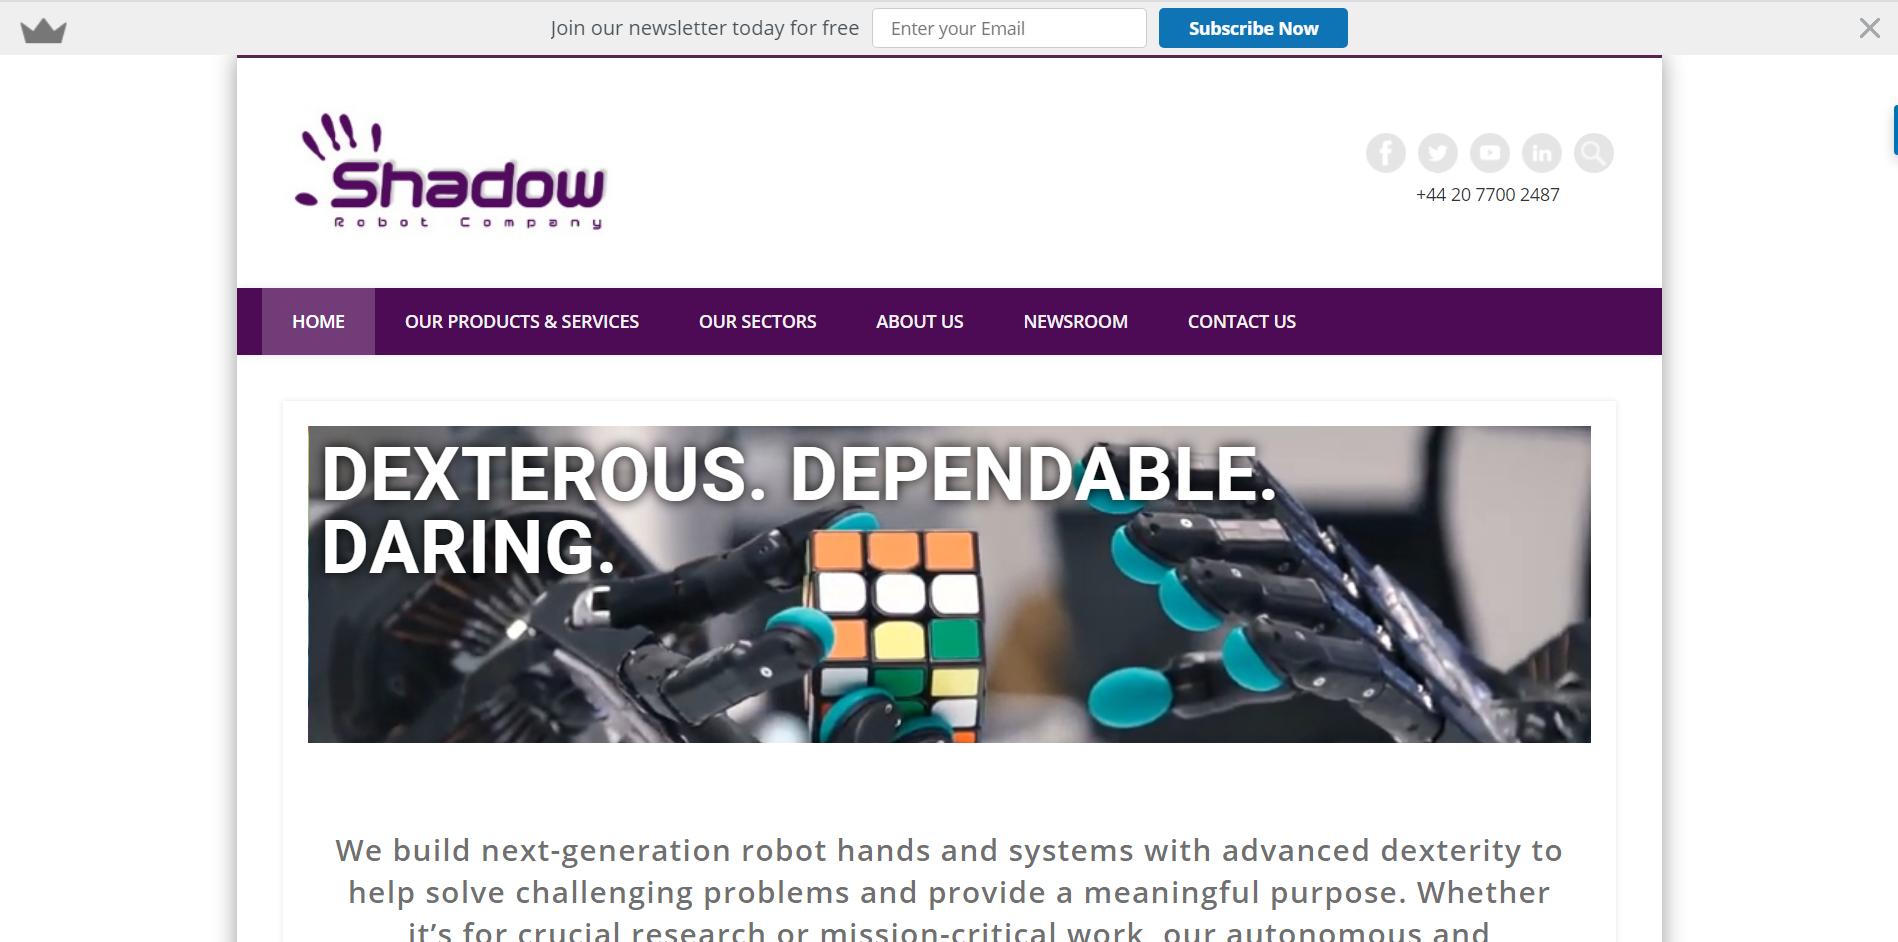 Shadow Robots